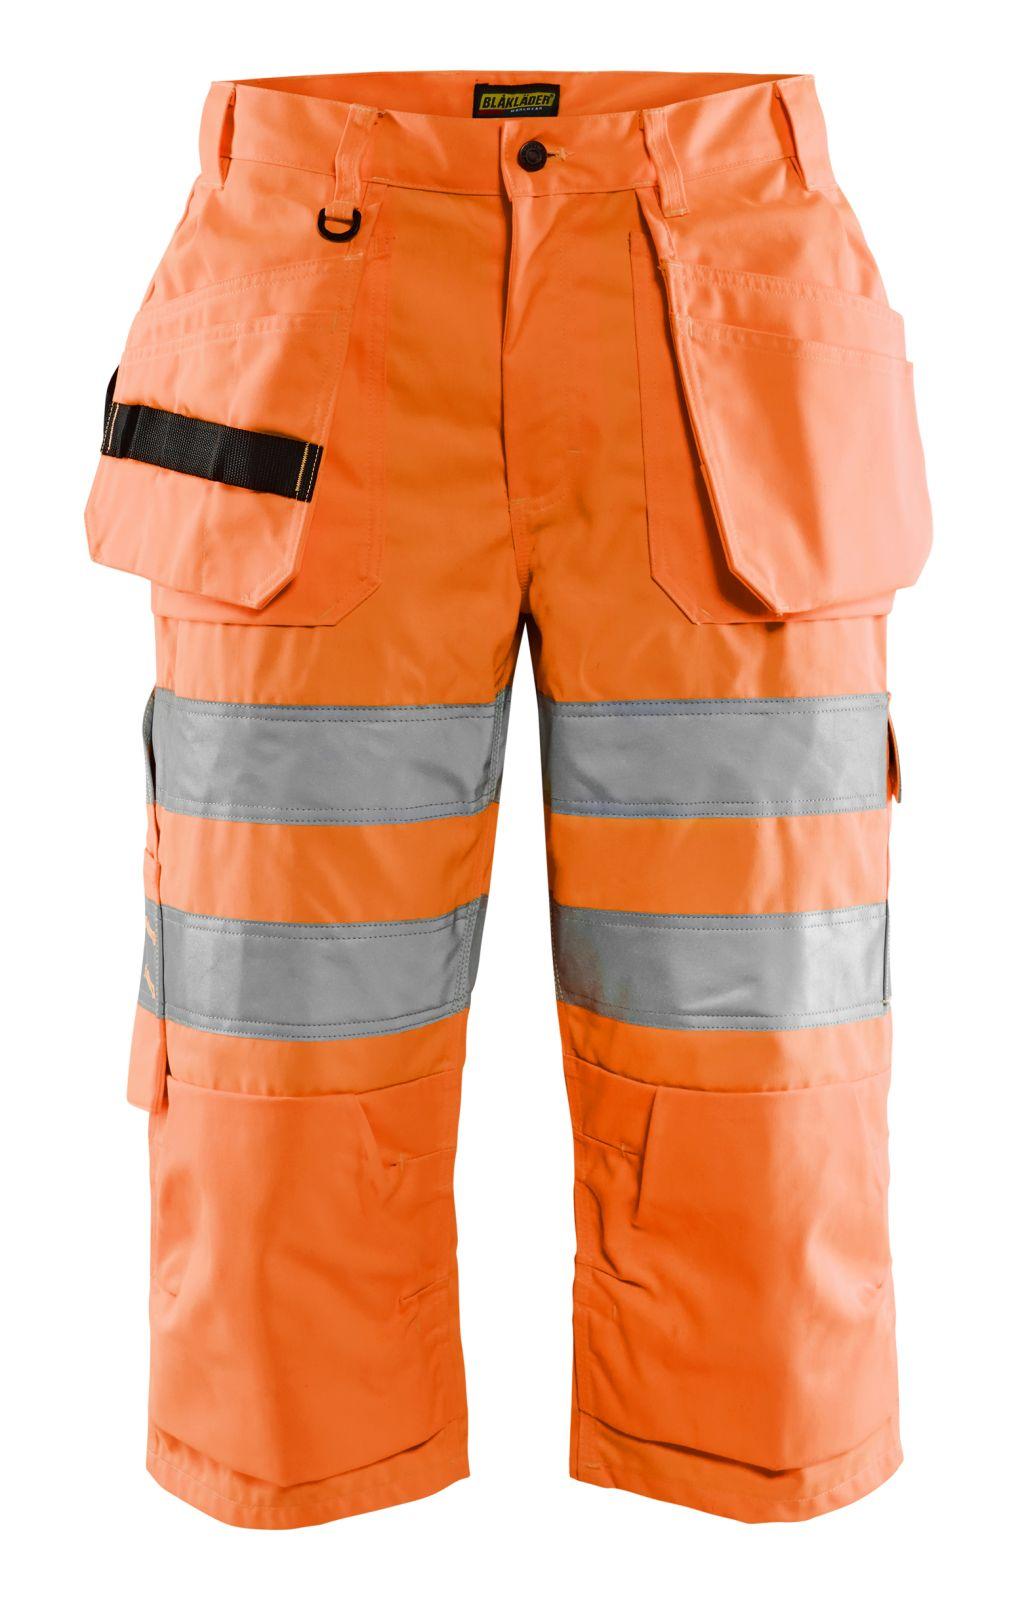 Blaklader Piraatbroeken 15391811 High Vis fluo oranje(5300)